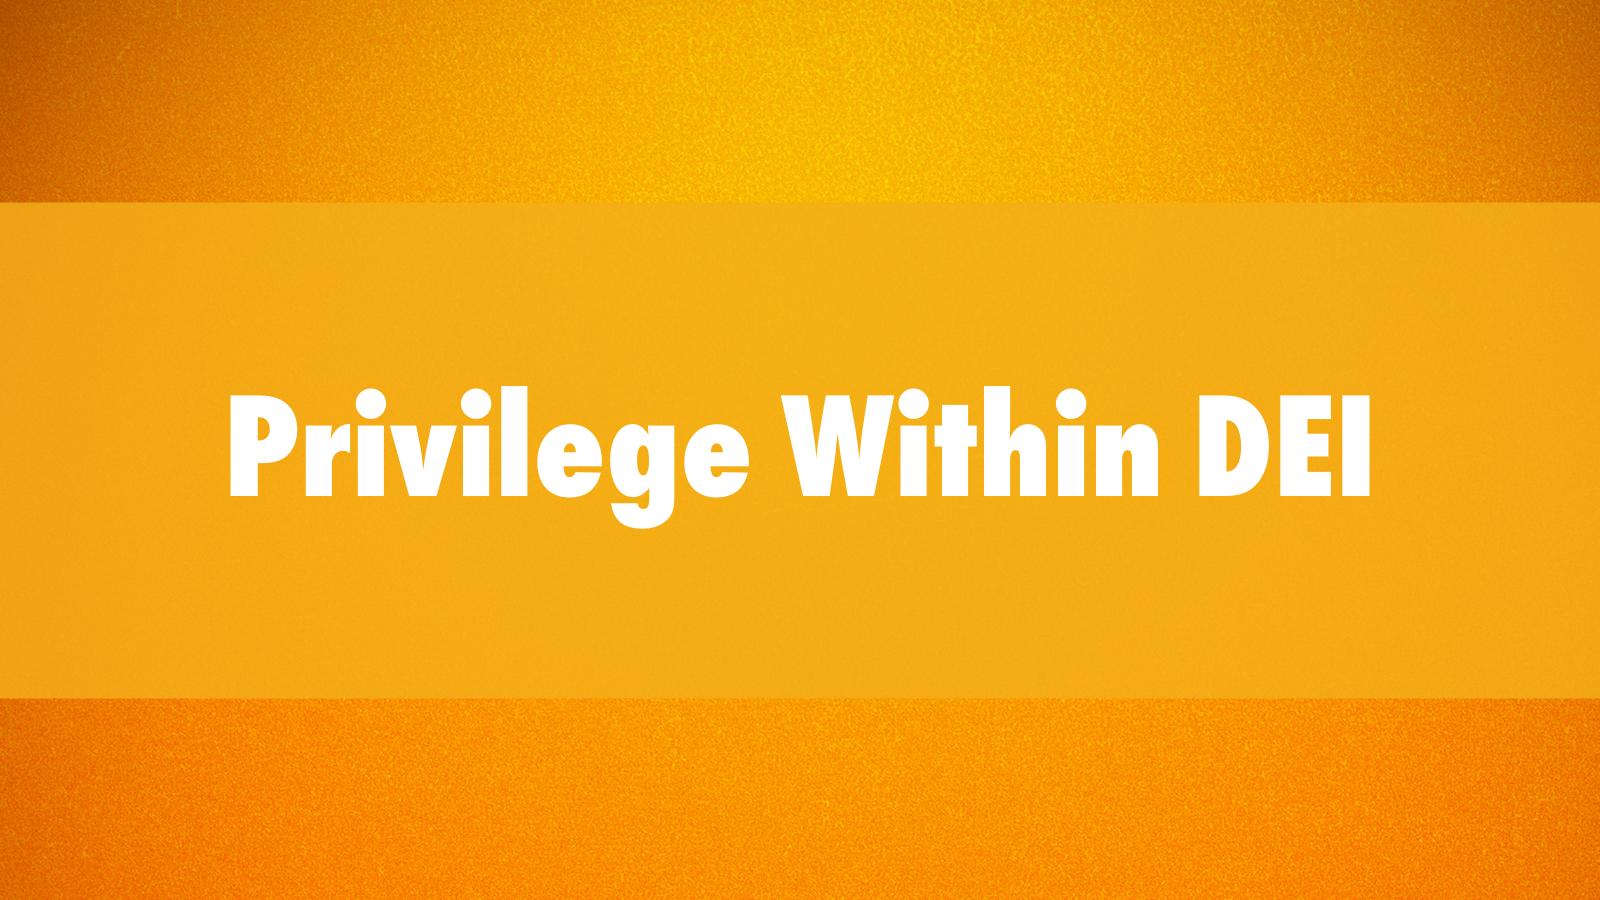 Privilege within DEI